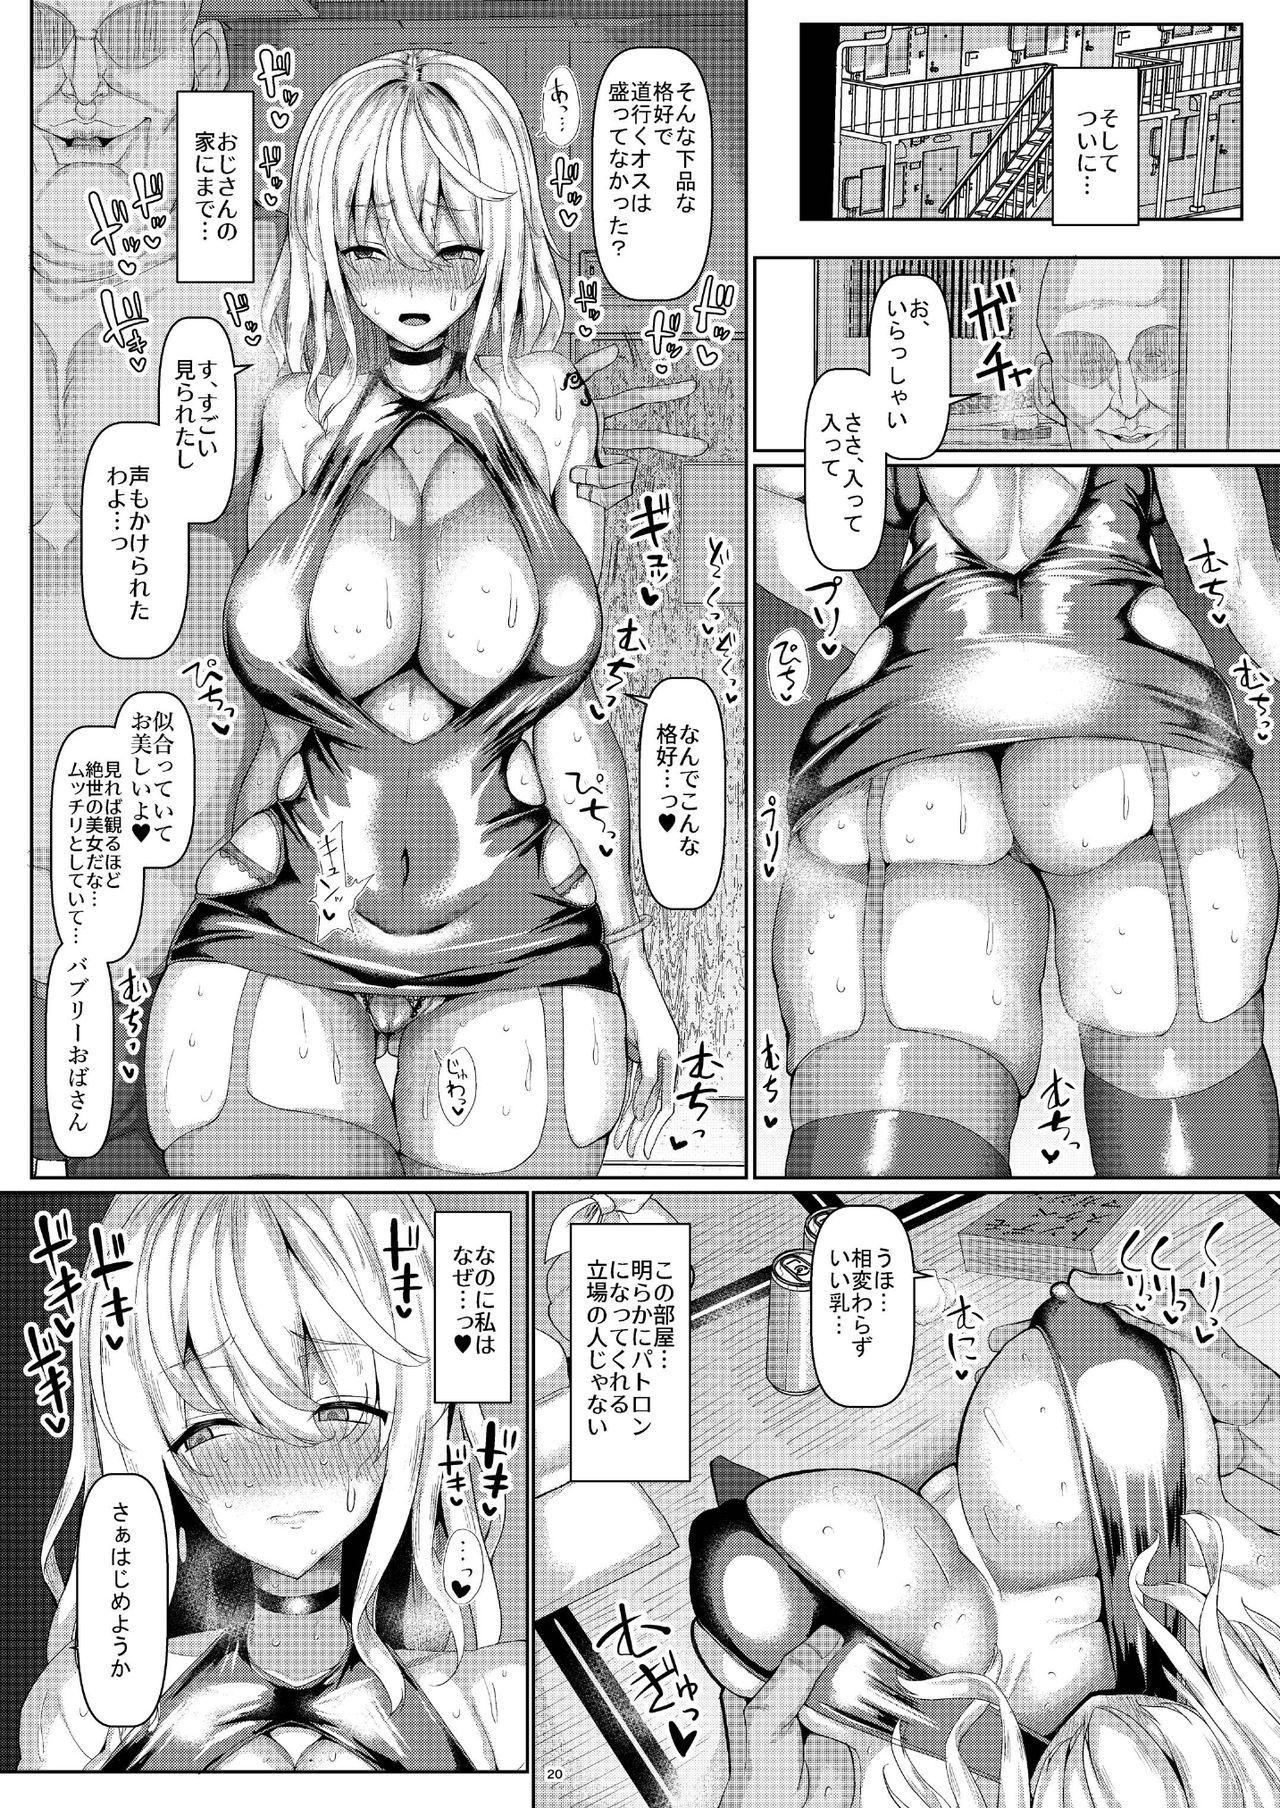 BodyCon Merry no Ogehin Koubi 21